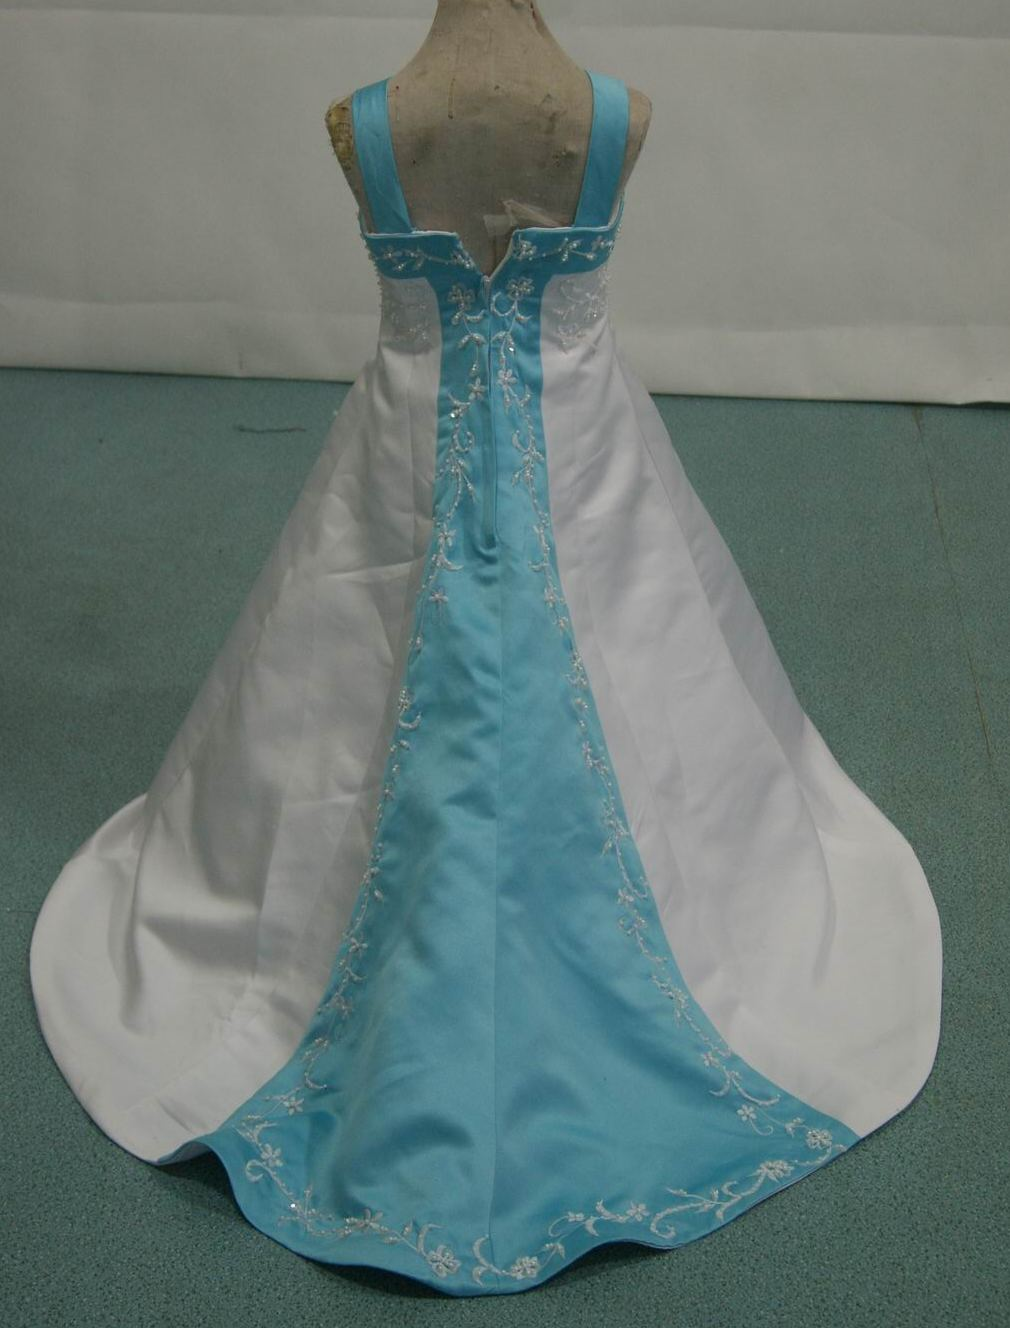 Miniature Wedding Dress With Pool Blue